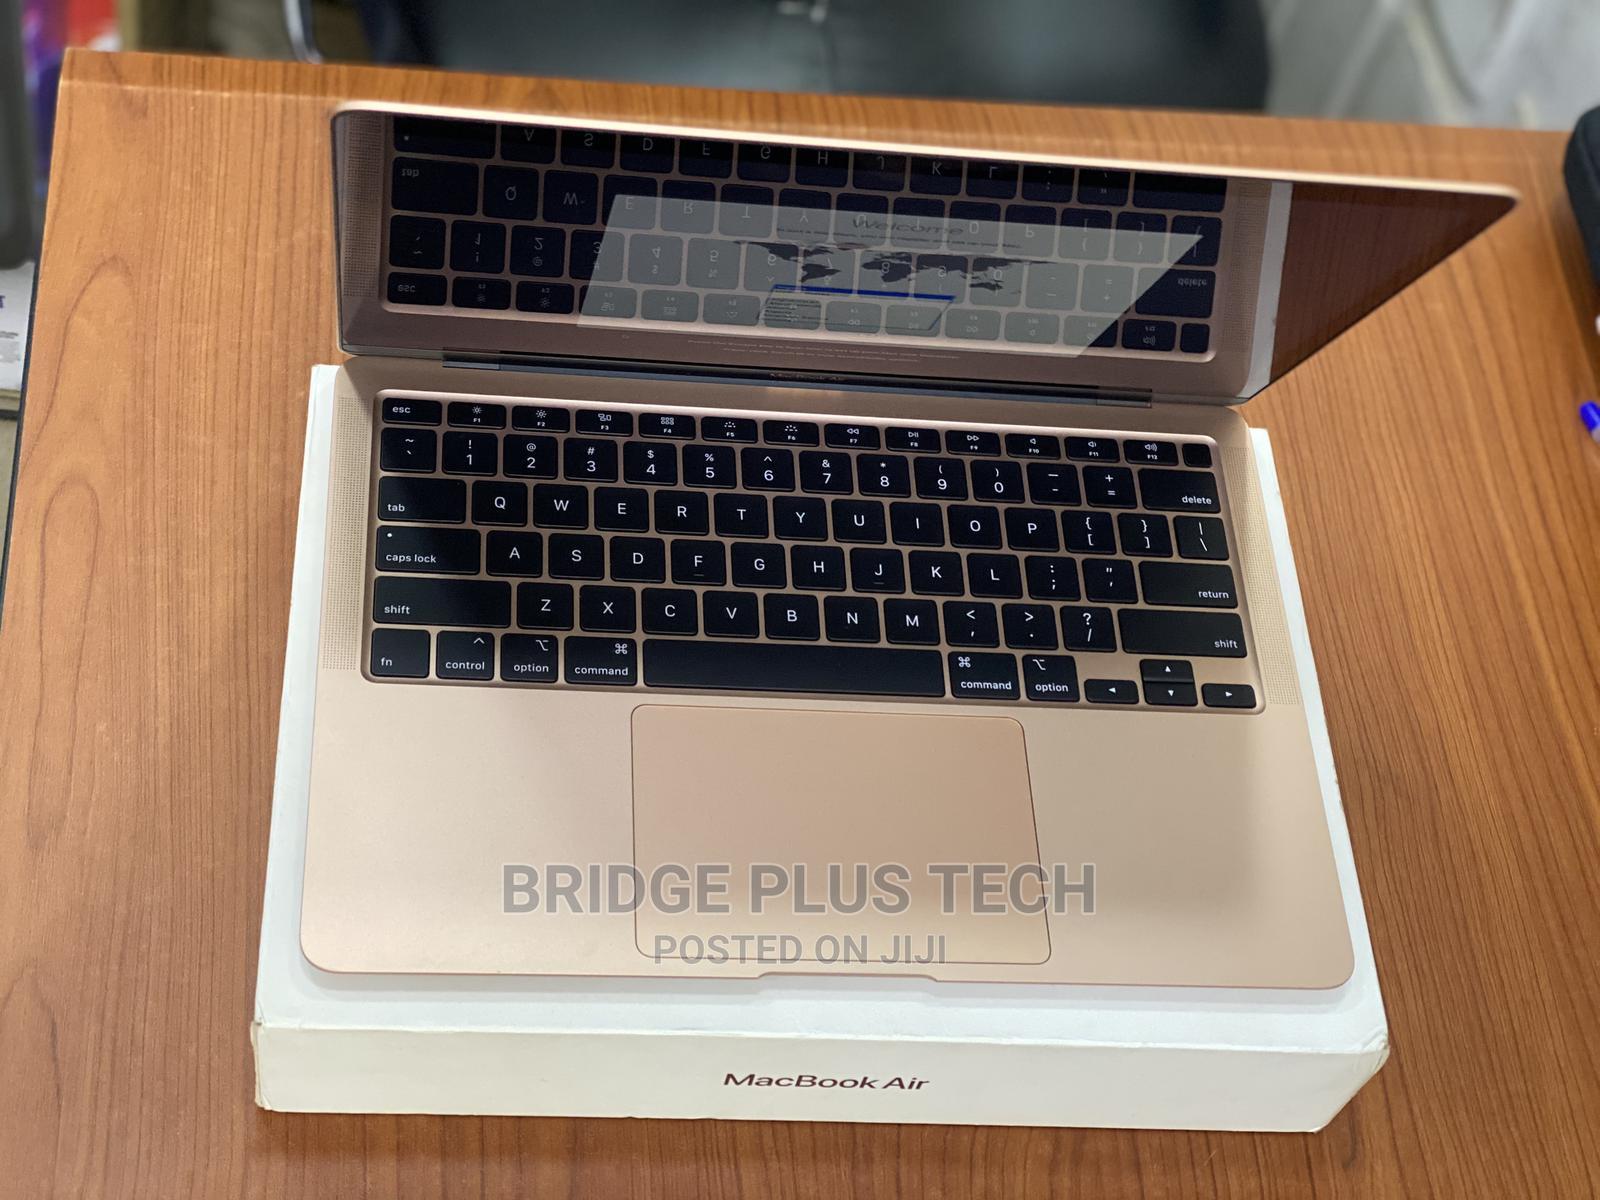 Laptop Apple MacBook Air 2020 8GB Intel Core I3 SSD 256GB | Laptops & Computers for sale in Ikeja, Lagos State, Nigeria